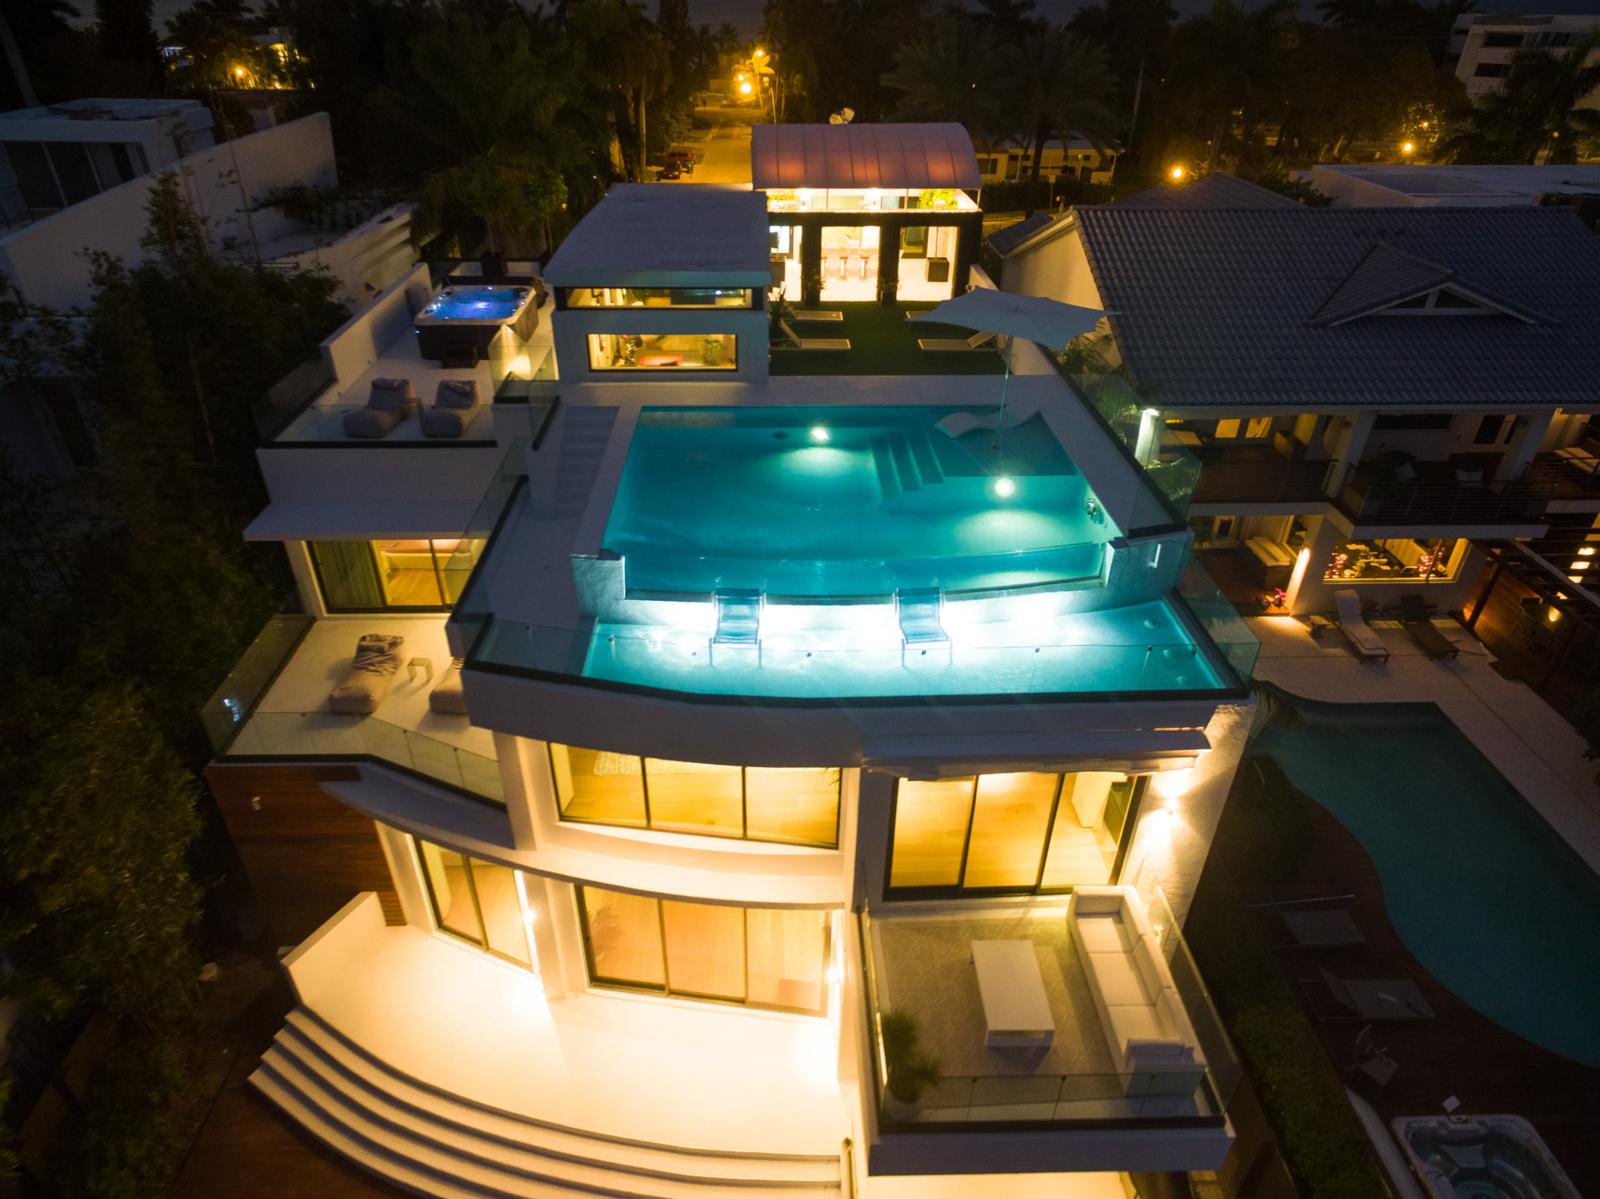 Exterior Rear Residence at Night  Villa Venetian by Choeff Levy Fischman